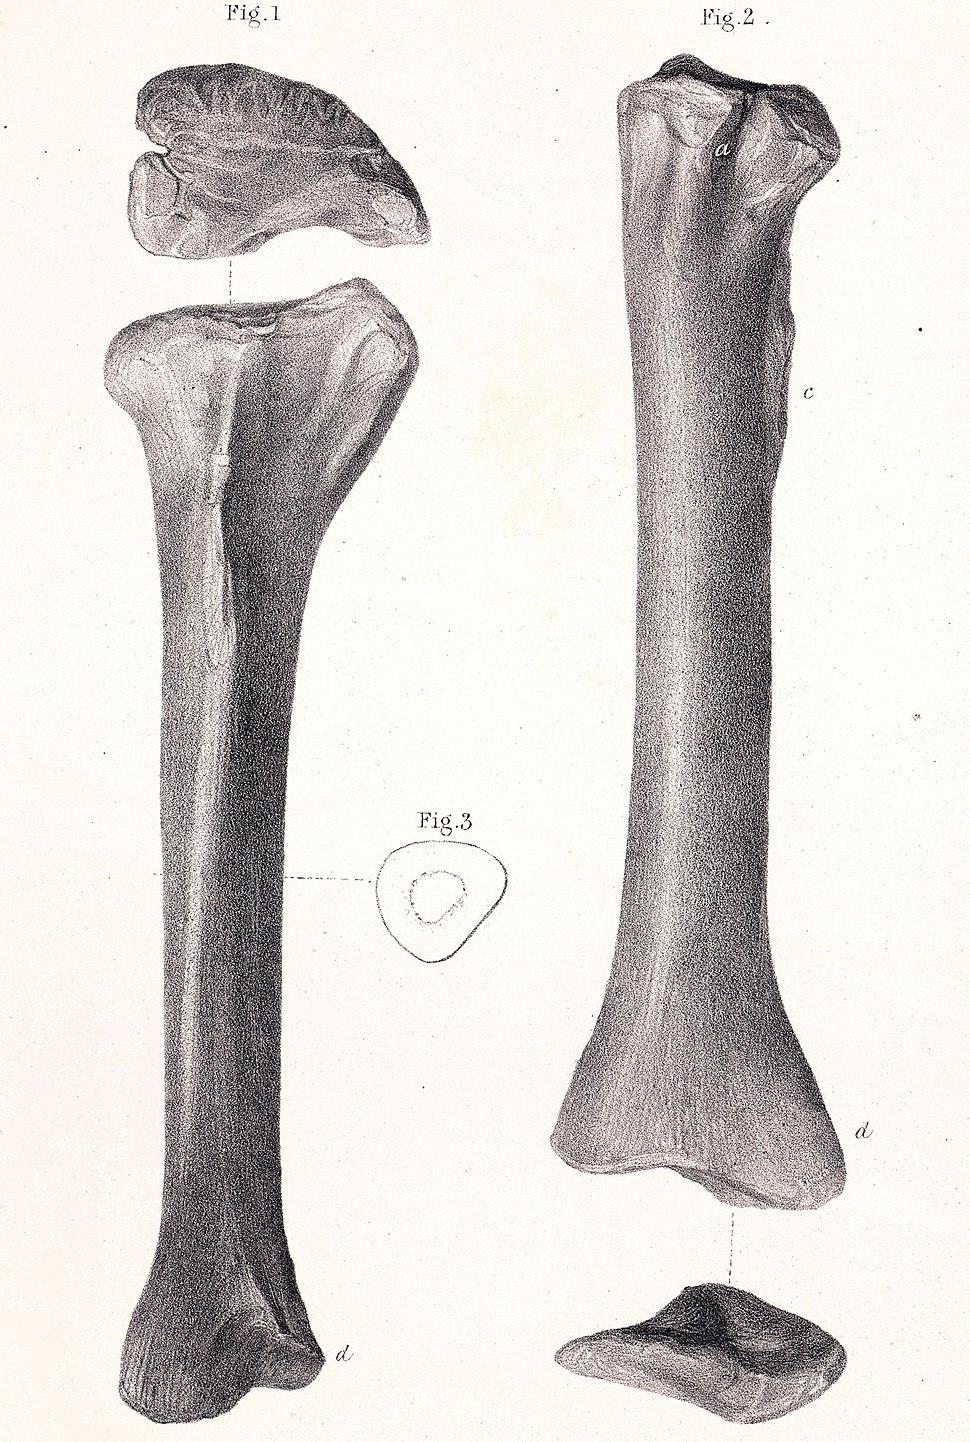 Megalosaurus tibia